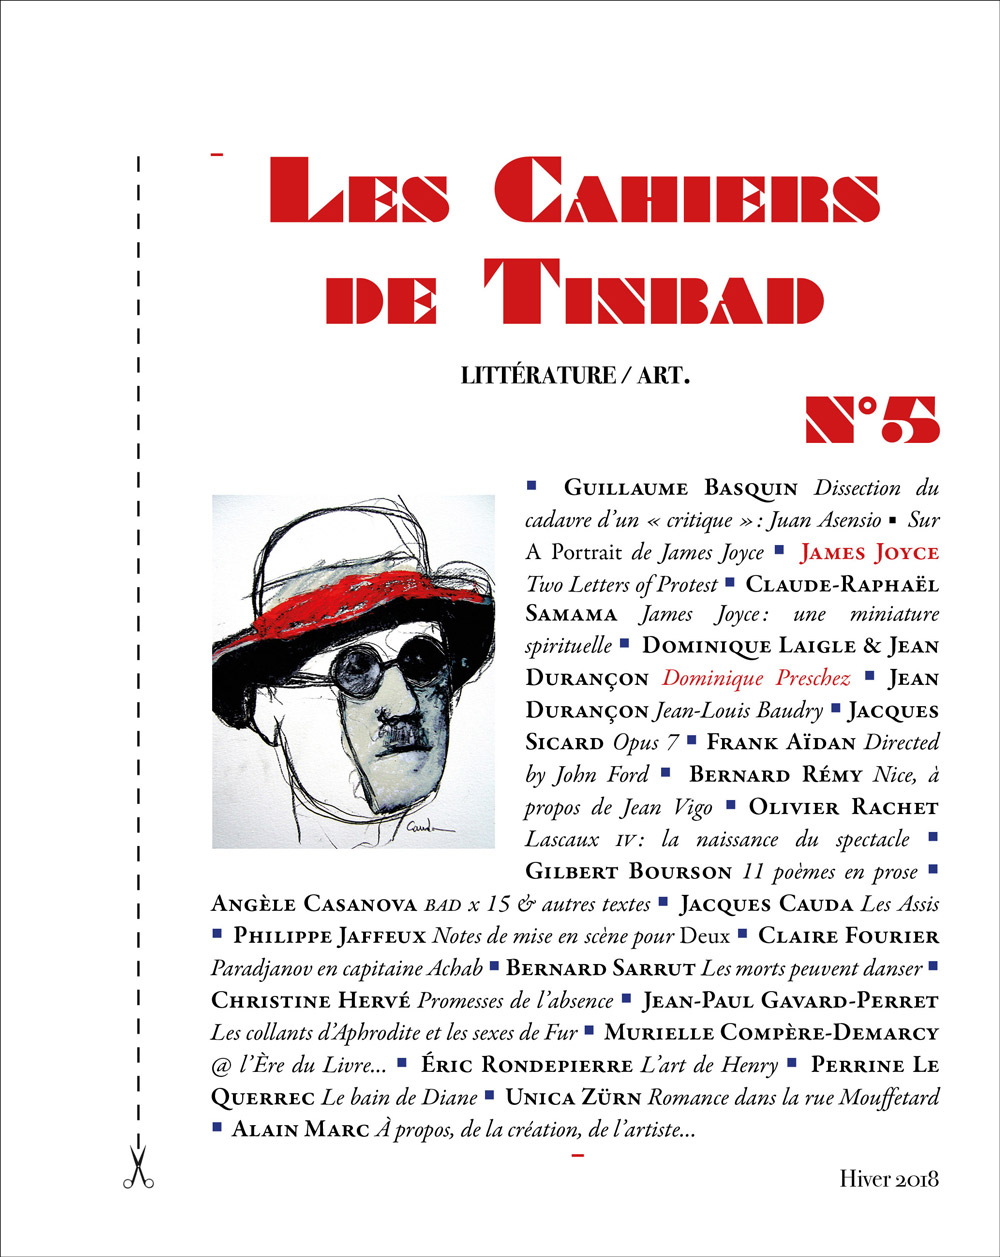 Les Cahiers de Tinbad, n°5